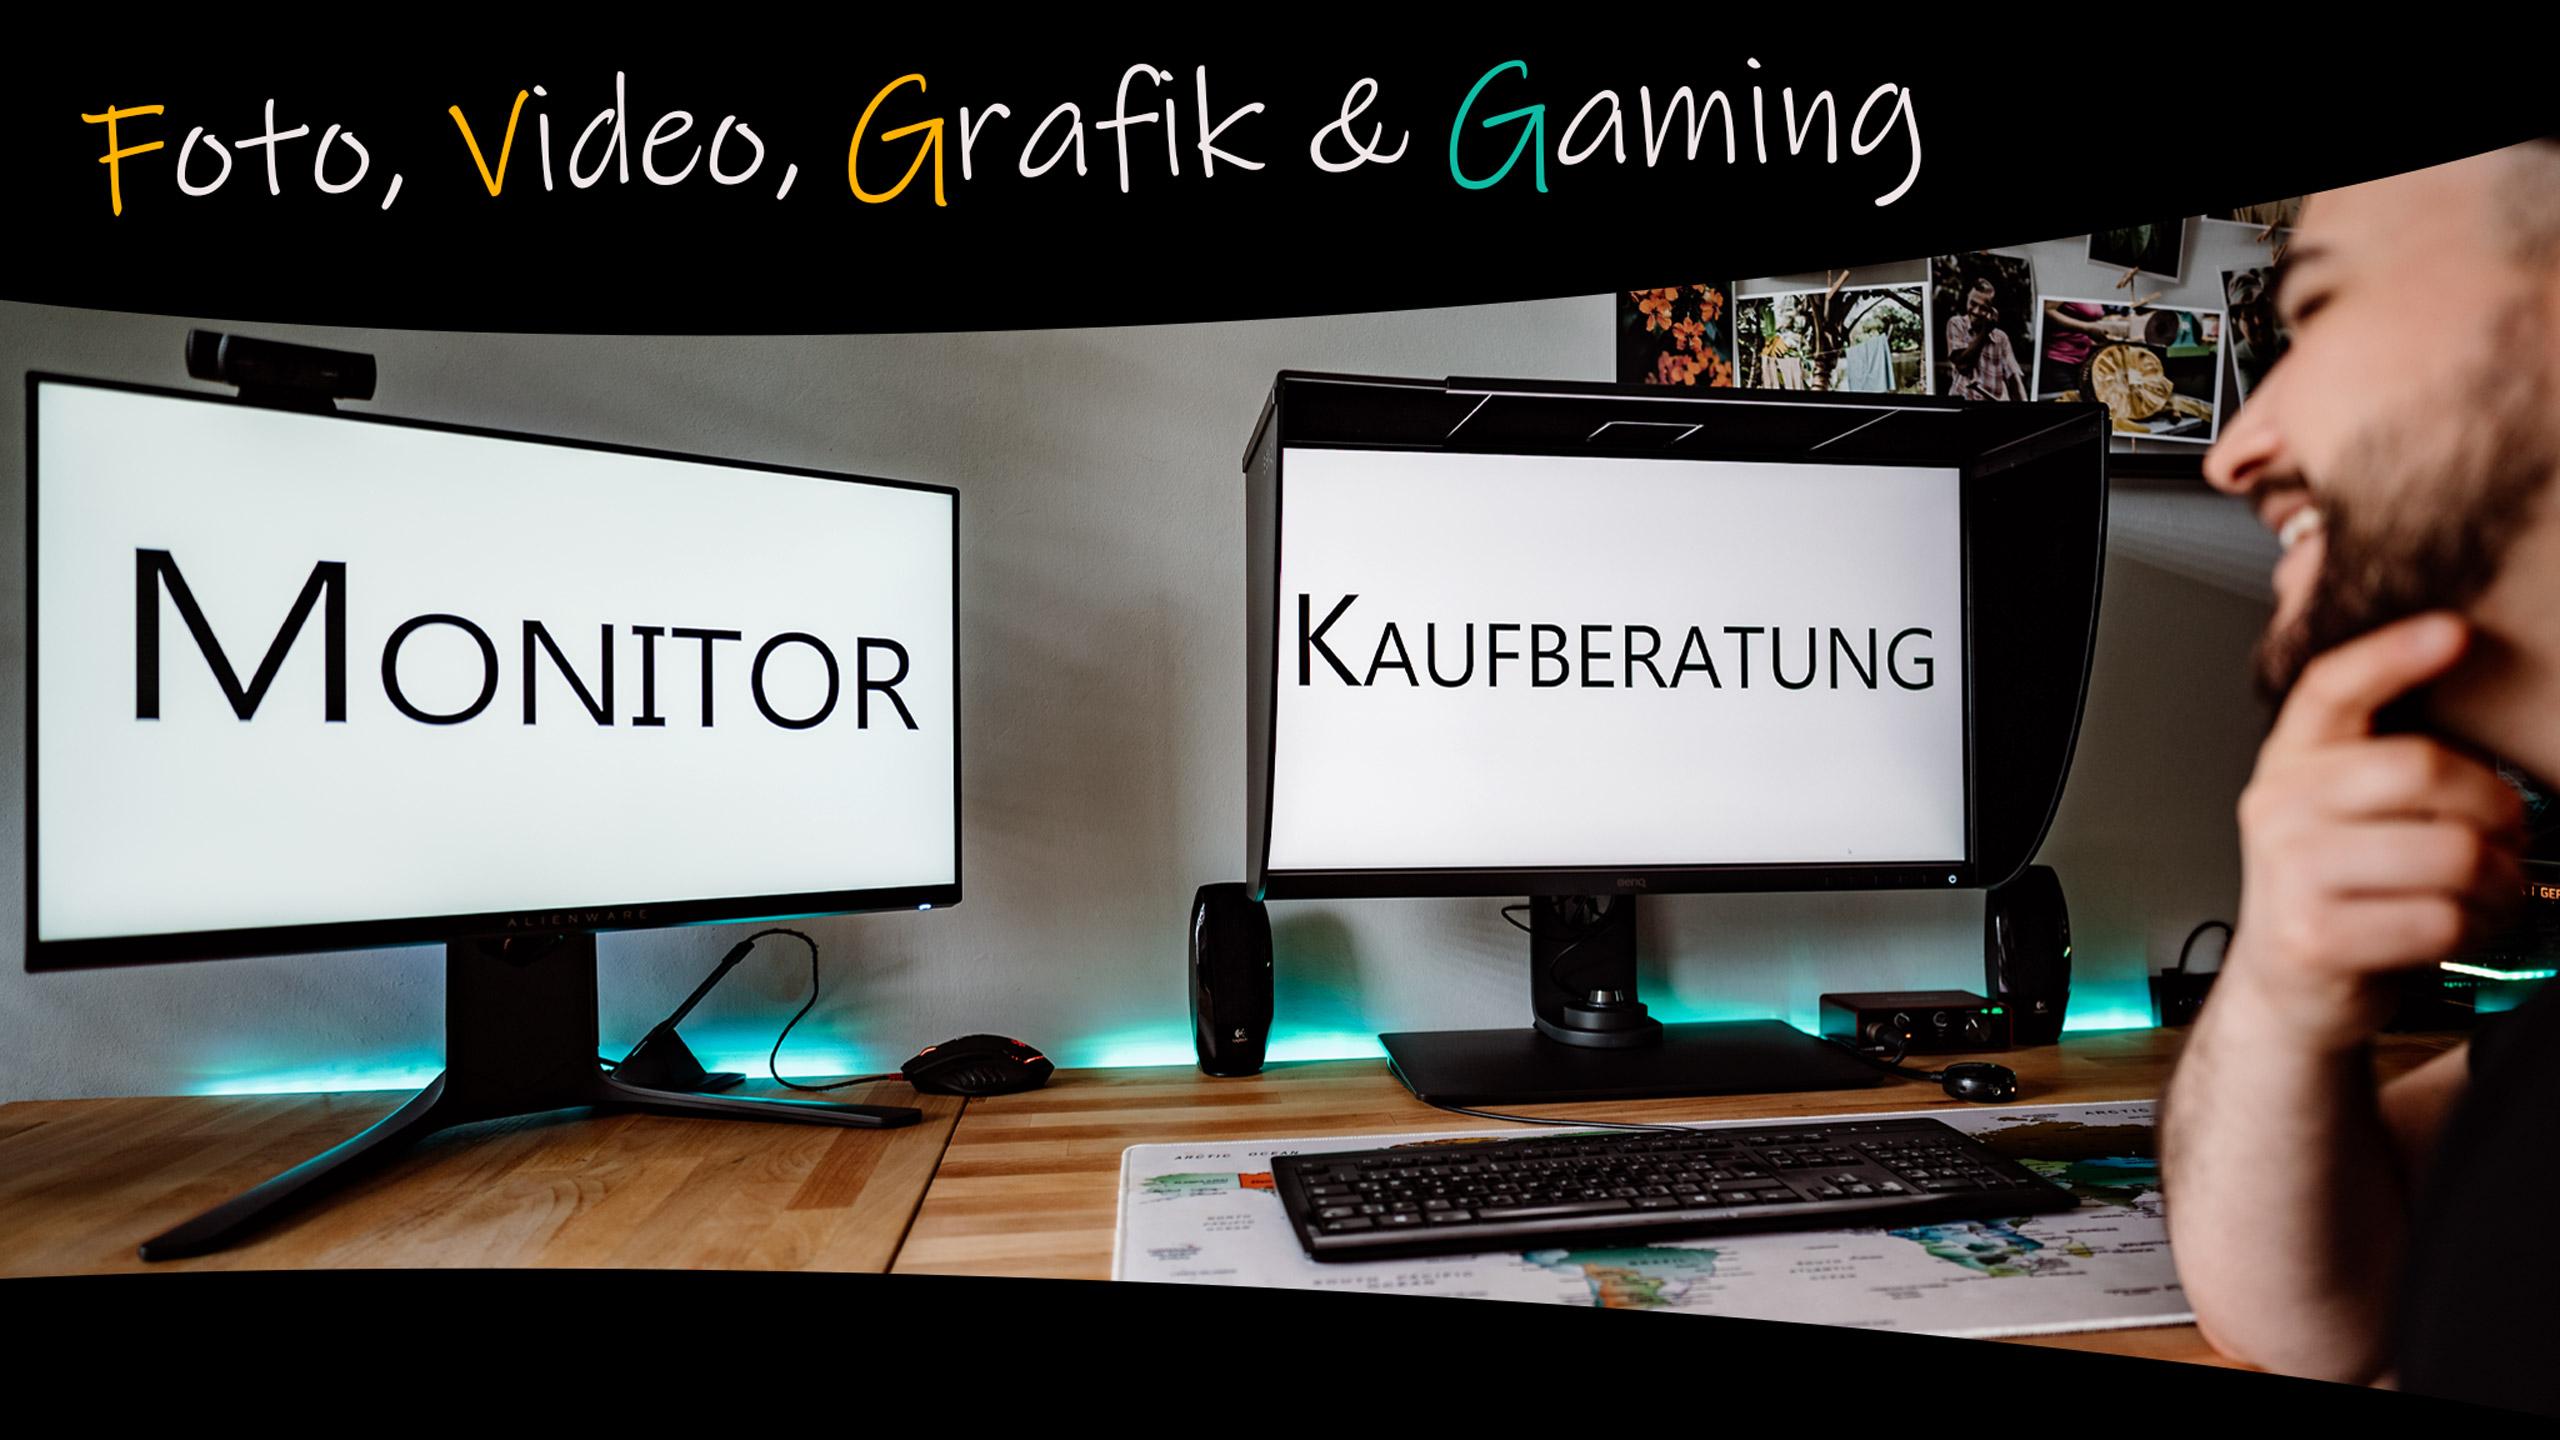 Monitor Kaufberatung Fotografie Videoschnitt Gaming Grafikdesign Thumbnail